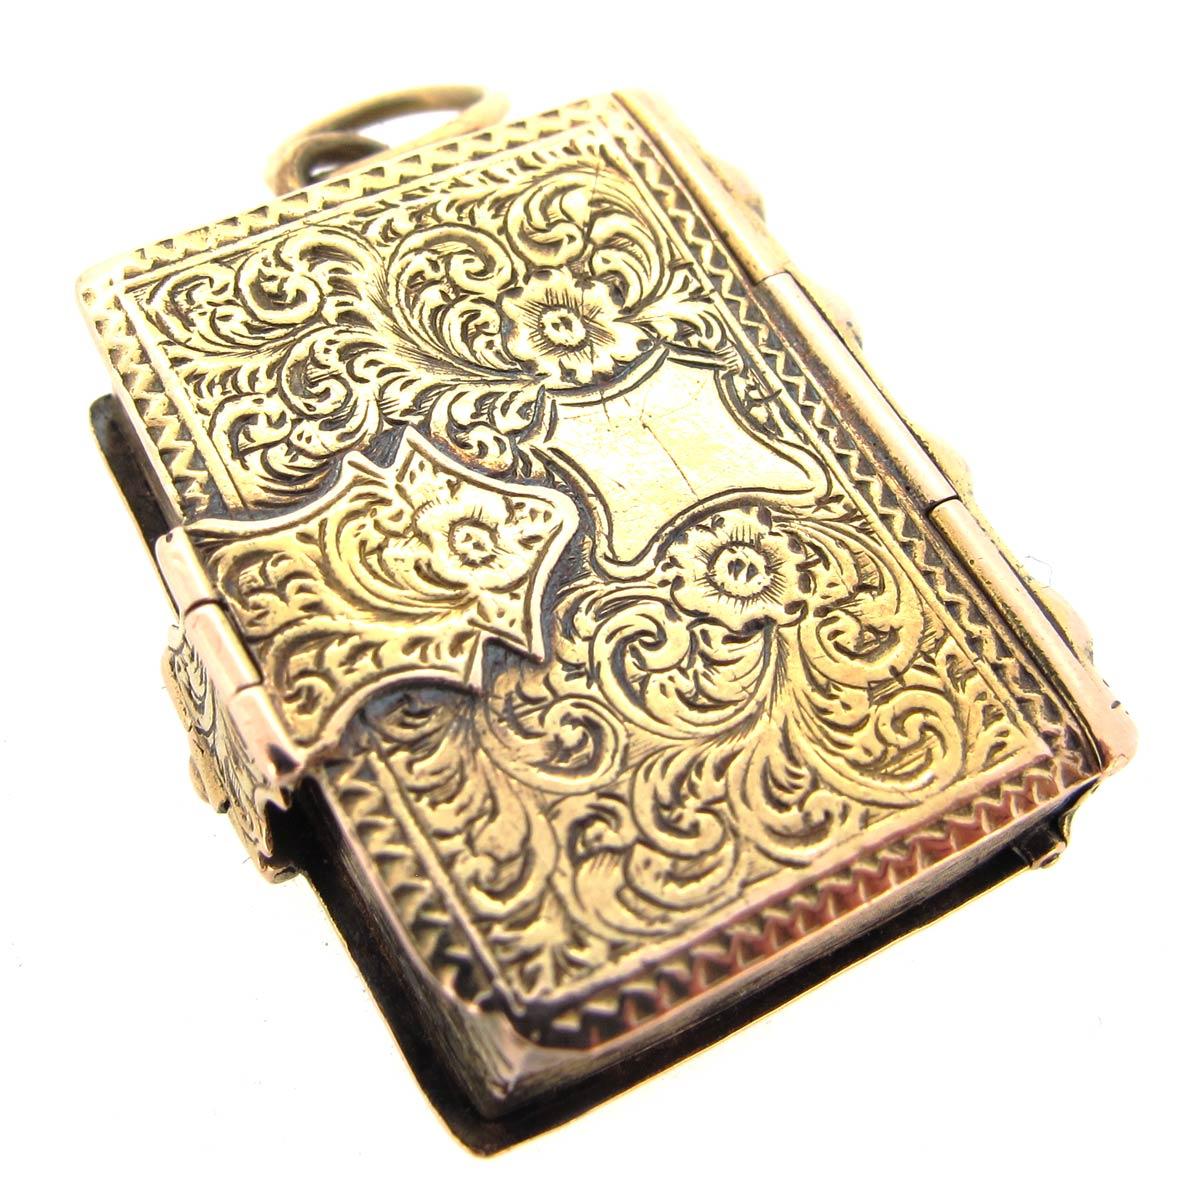 Antique Gold Book Locket